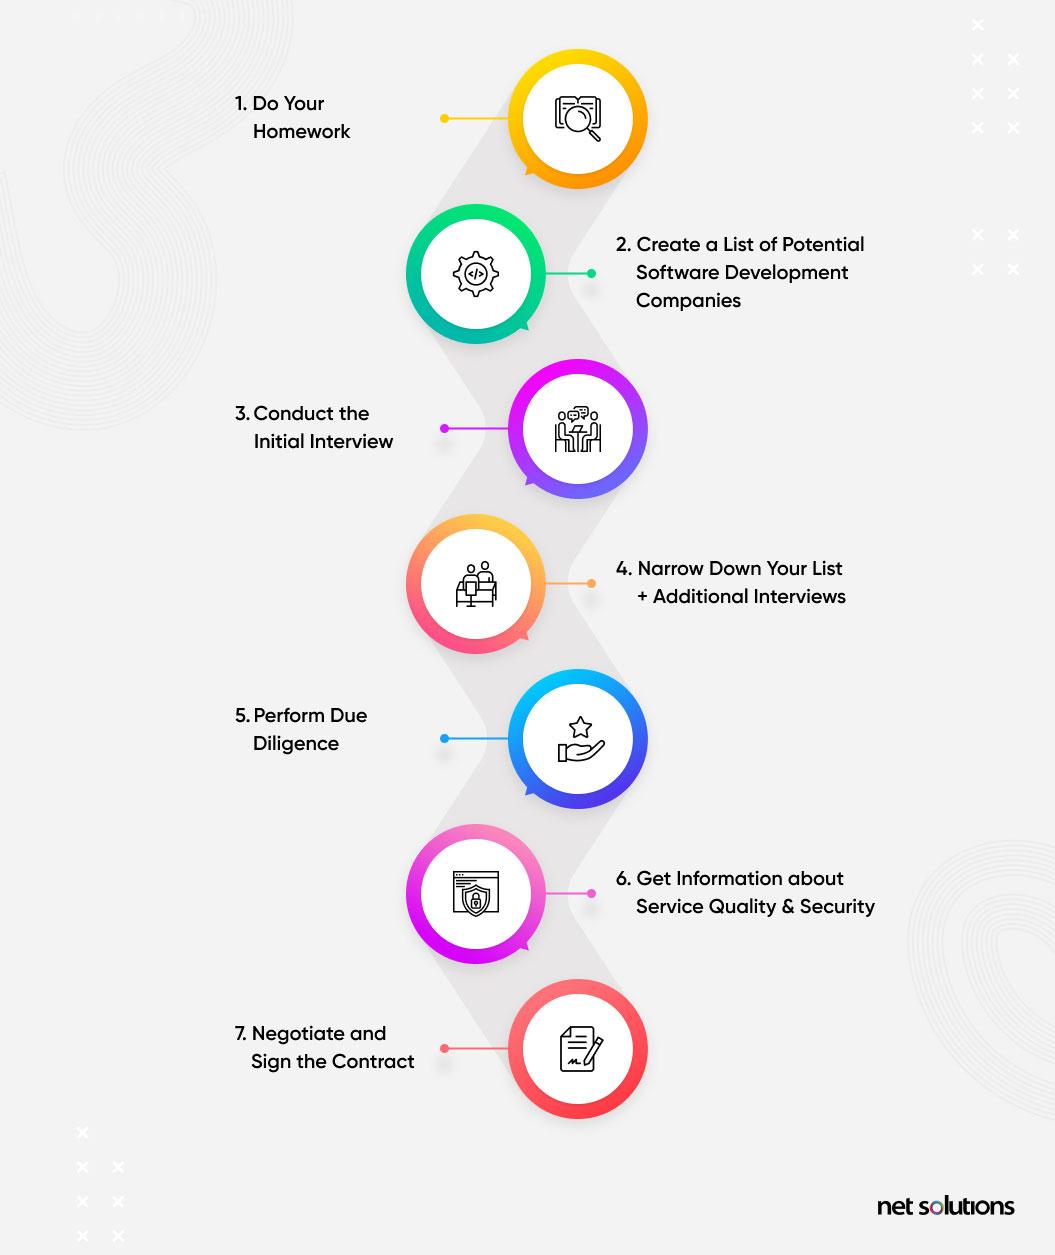 process to hire a remote software development team